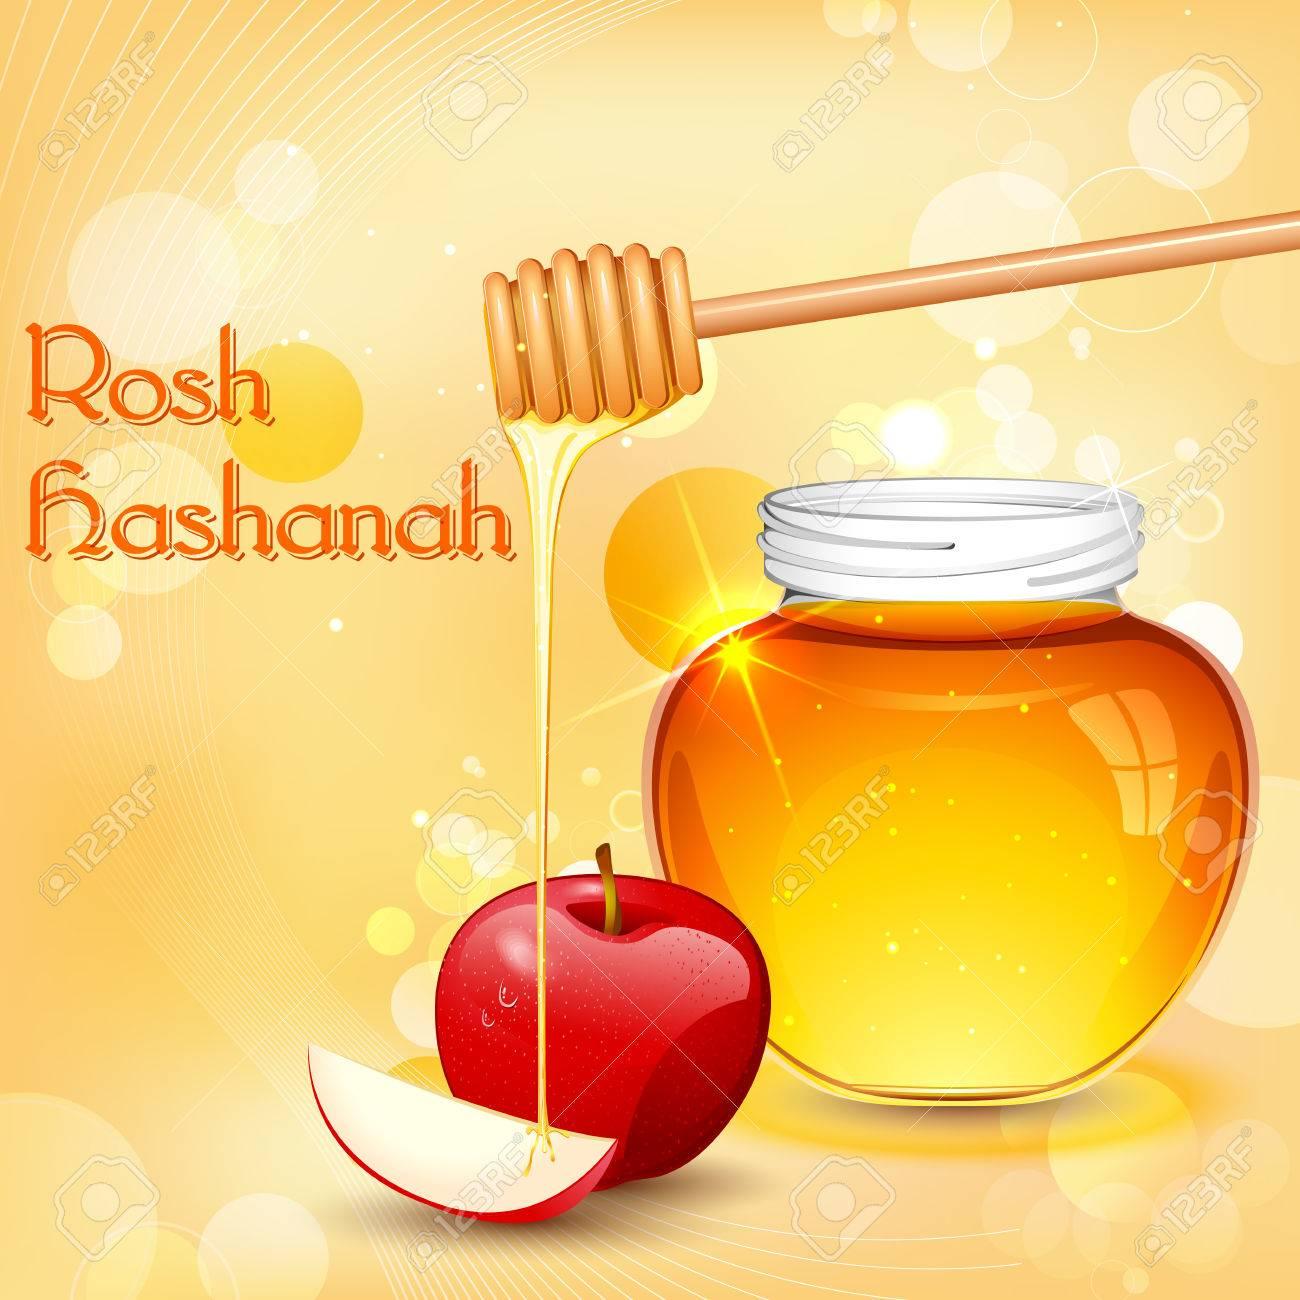 3486 Rosh Hashanah Cliparts Stock Vector And Royalty Free Rosh